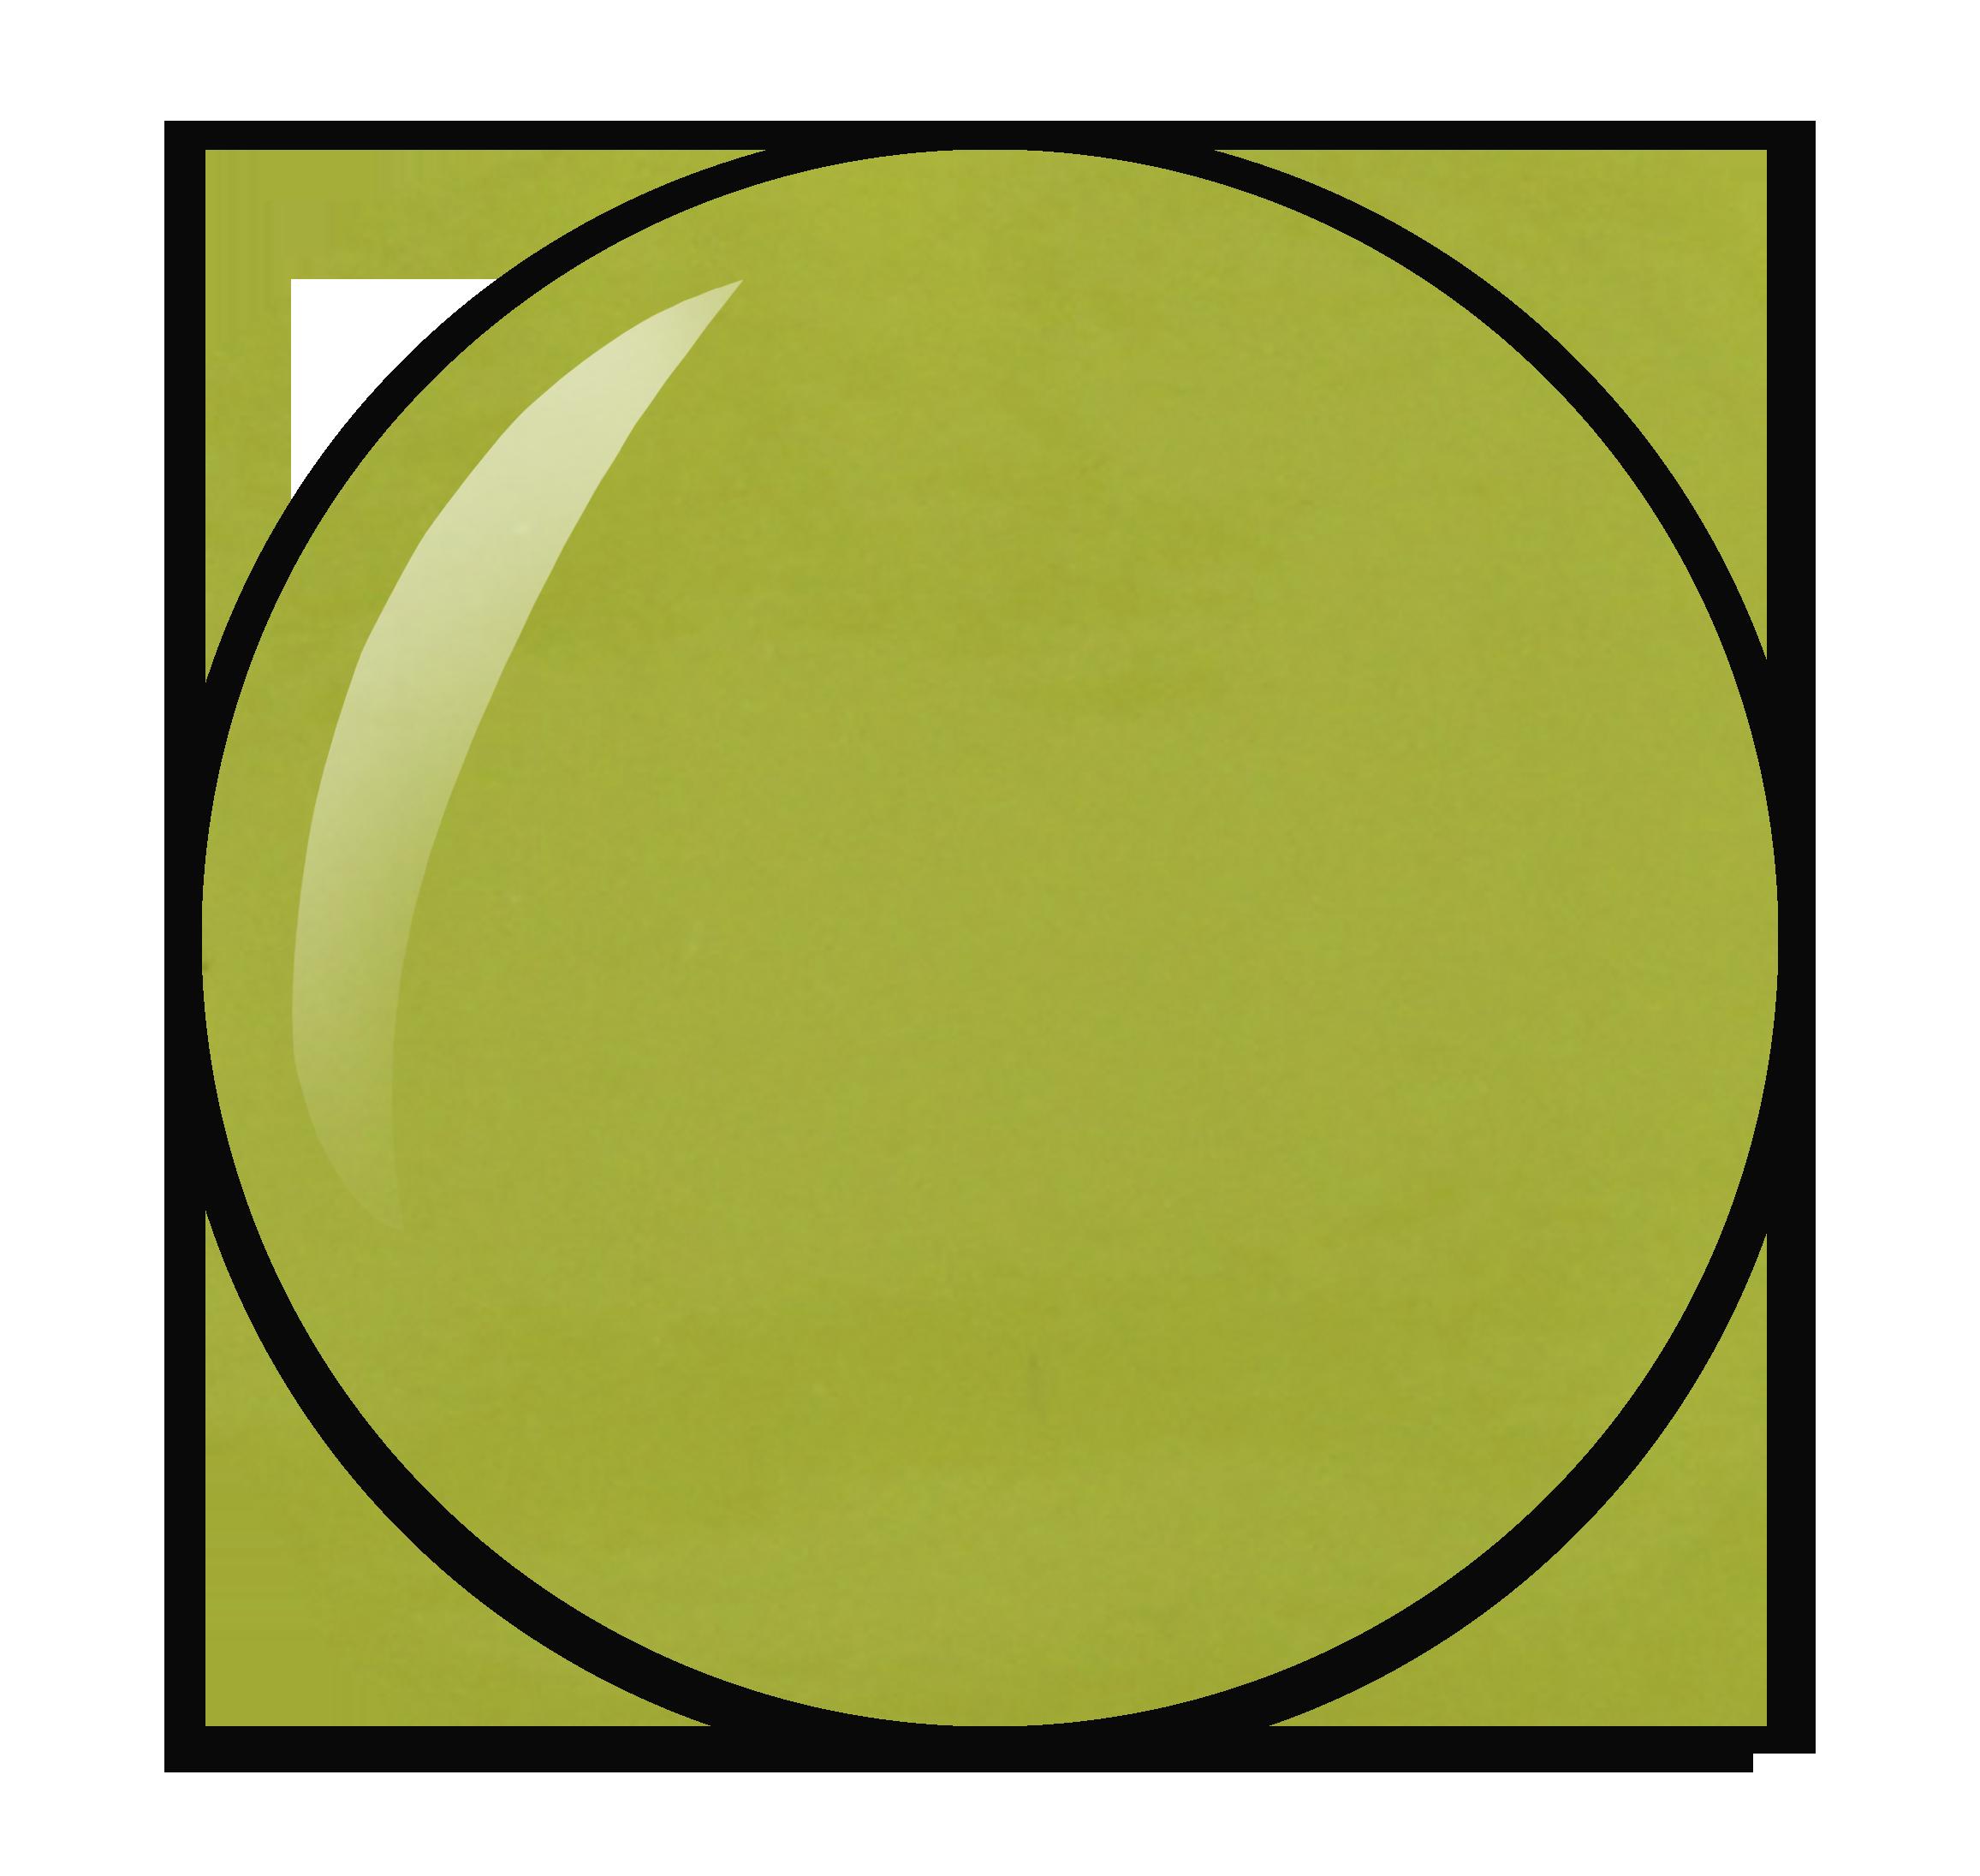 lime groene nagellak kleurnummer 172 uit de Herôme nagellak collectie